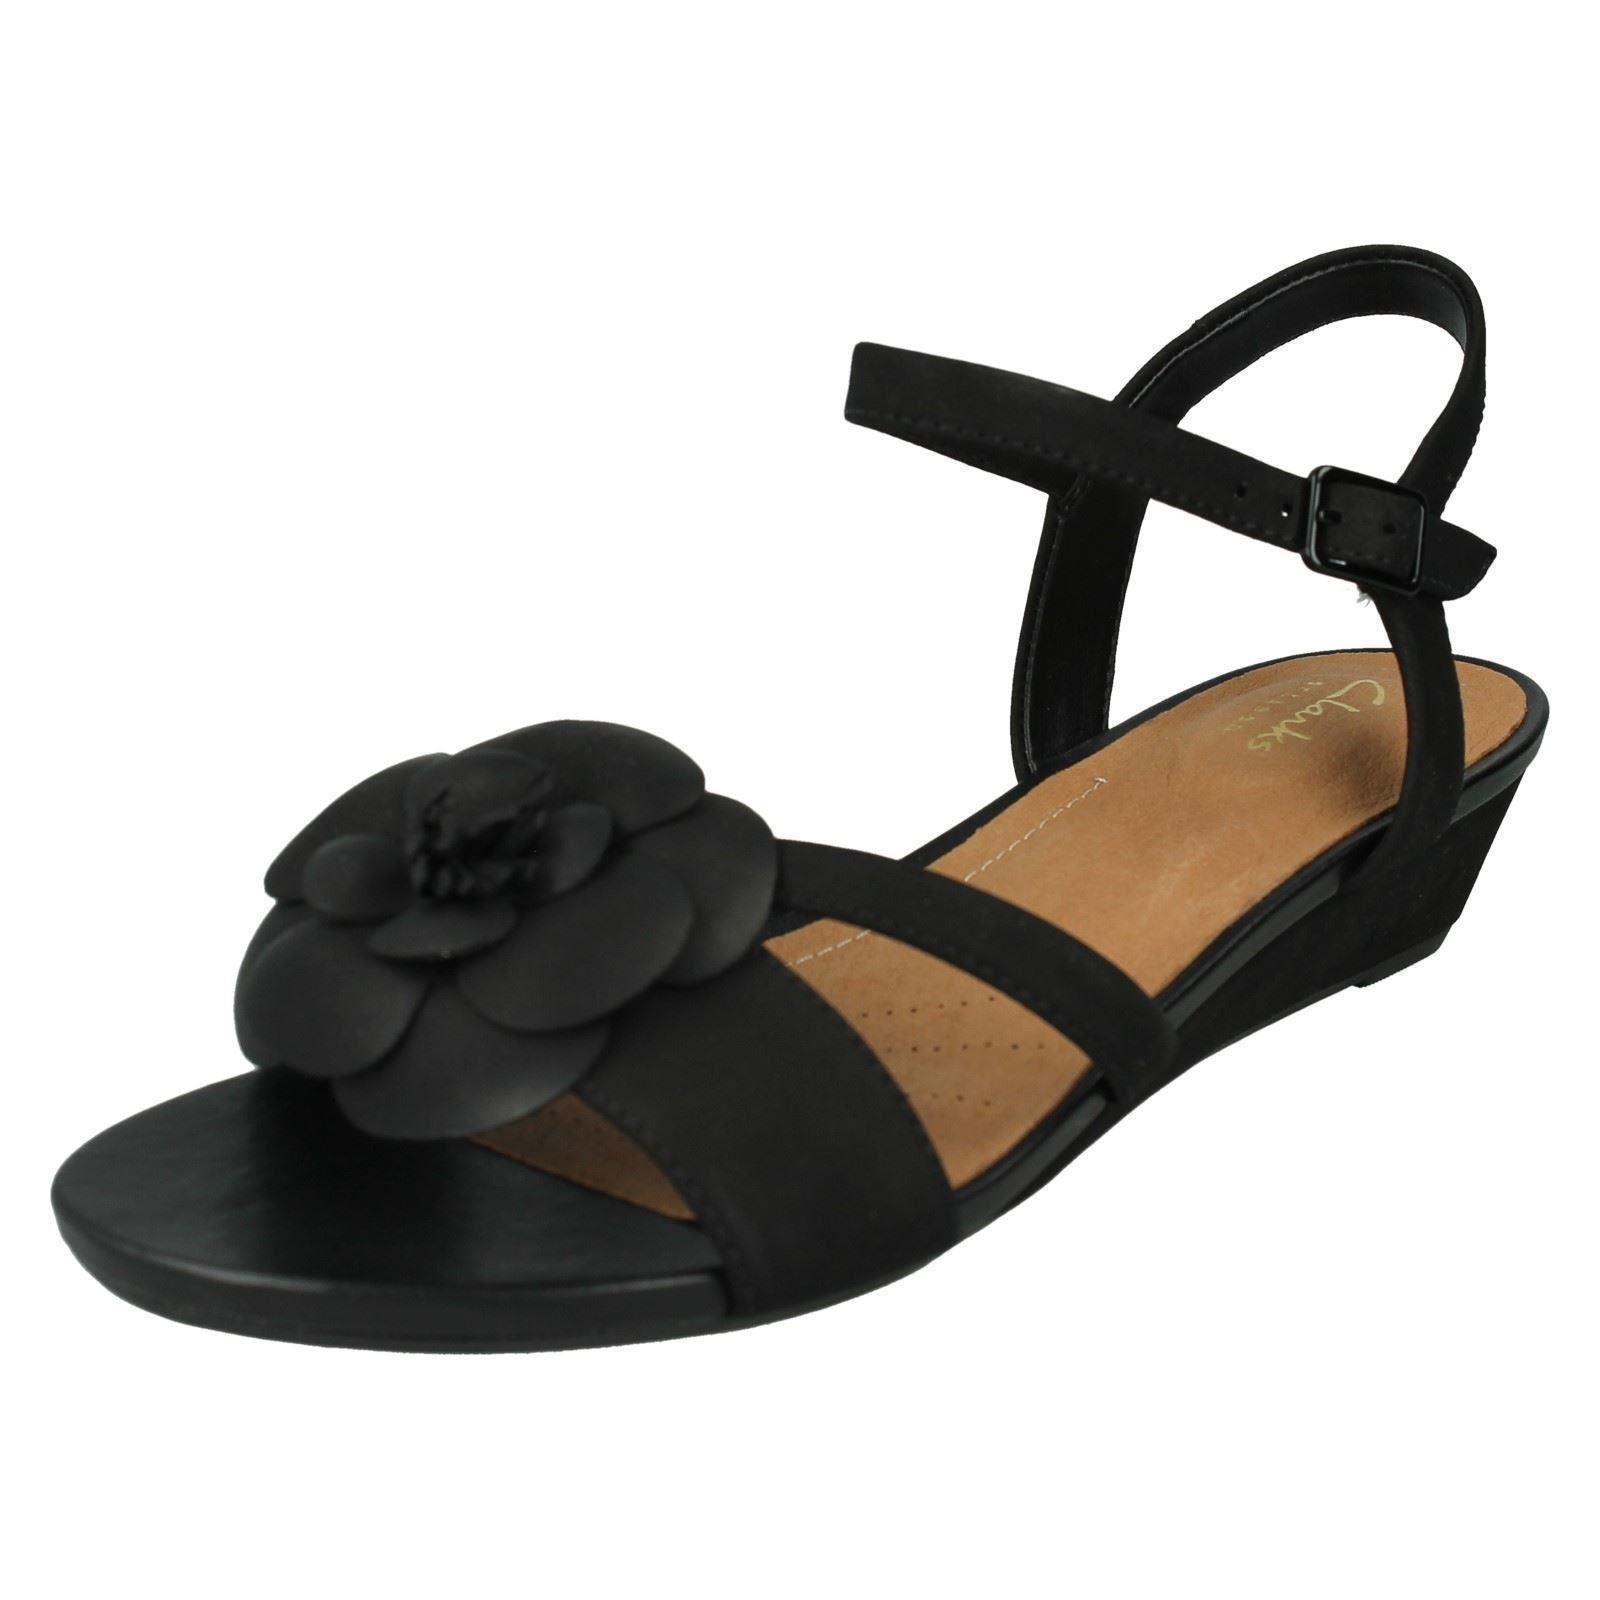 b64283fba54 Women s Clarks Parram Stella Strap Sandals in Black UK 4.5   EU 37 1 ...